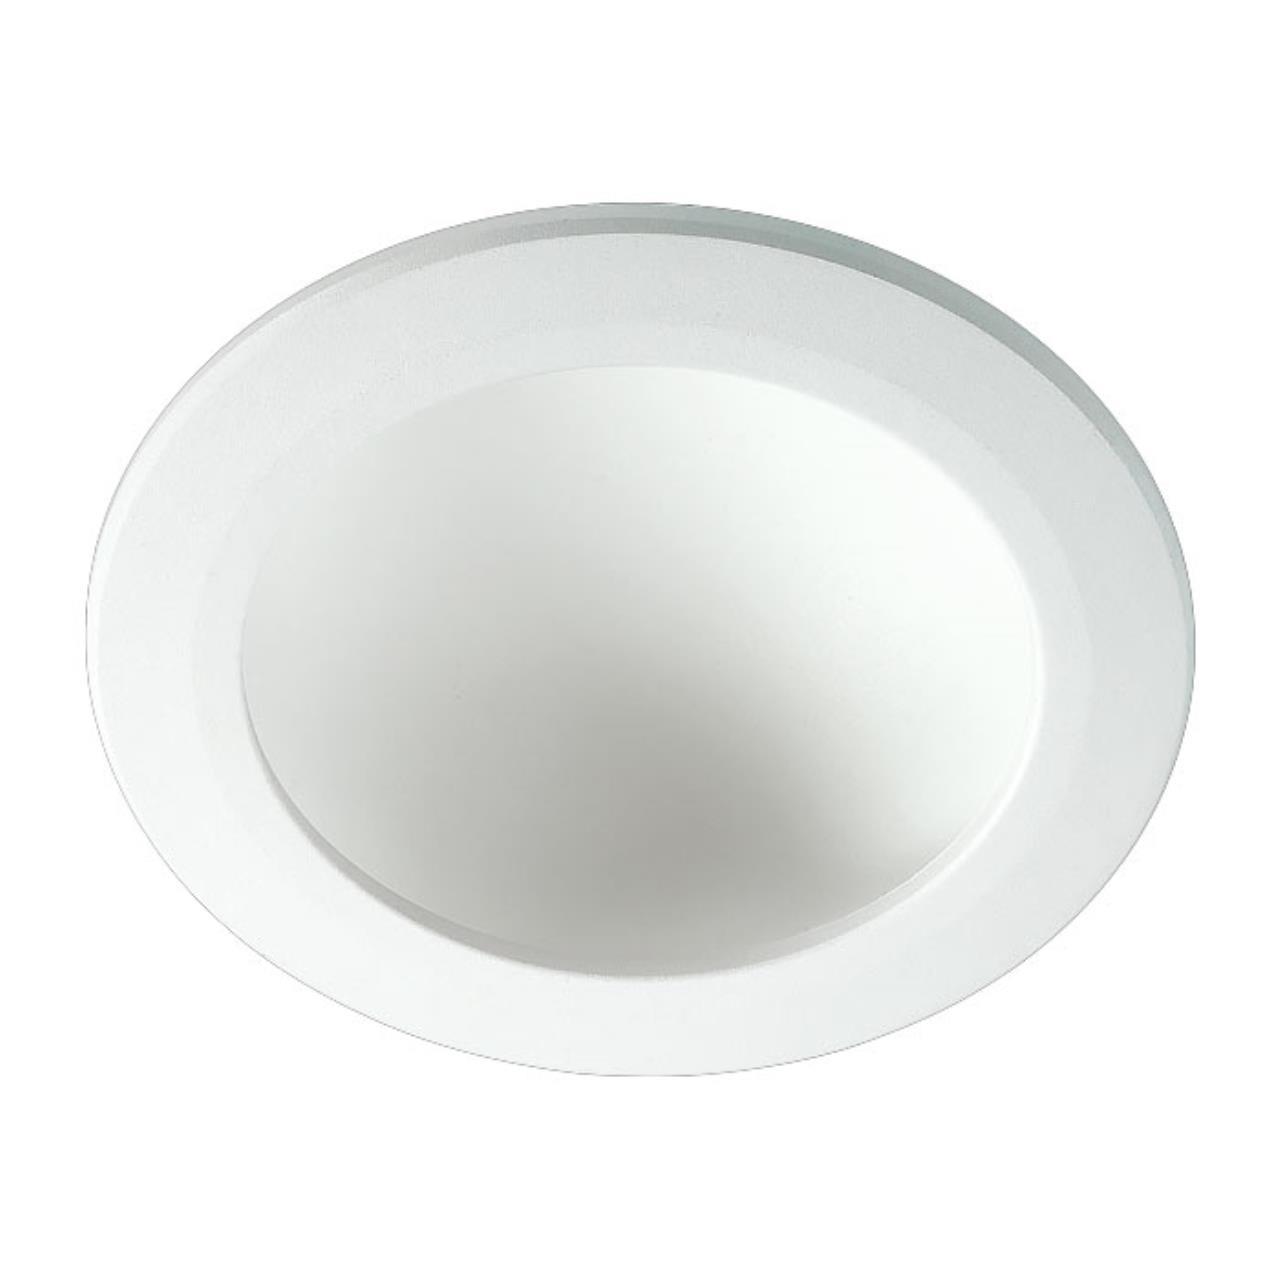 357353 SPOT NT17 80 белый Встраиваемый светильник IP20 LED 3000K 12W 85-265V GESSO